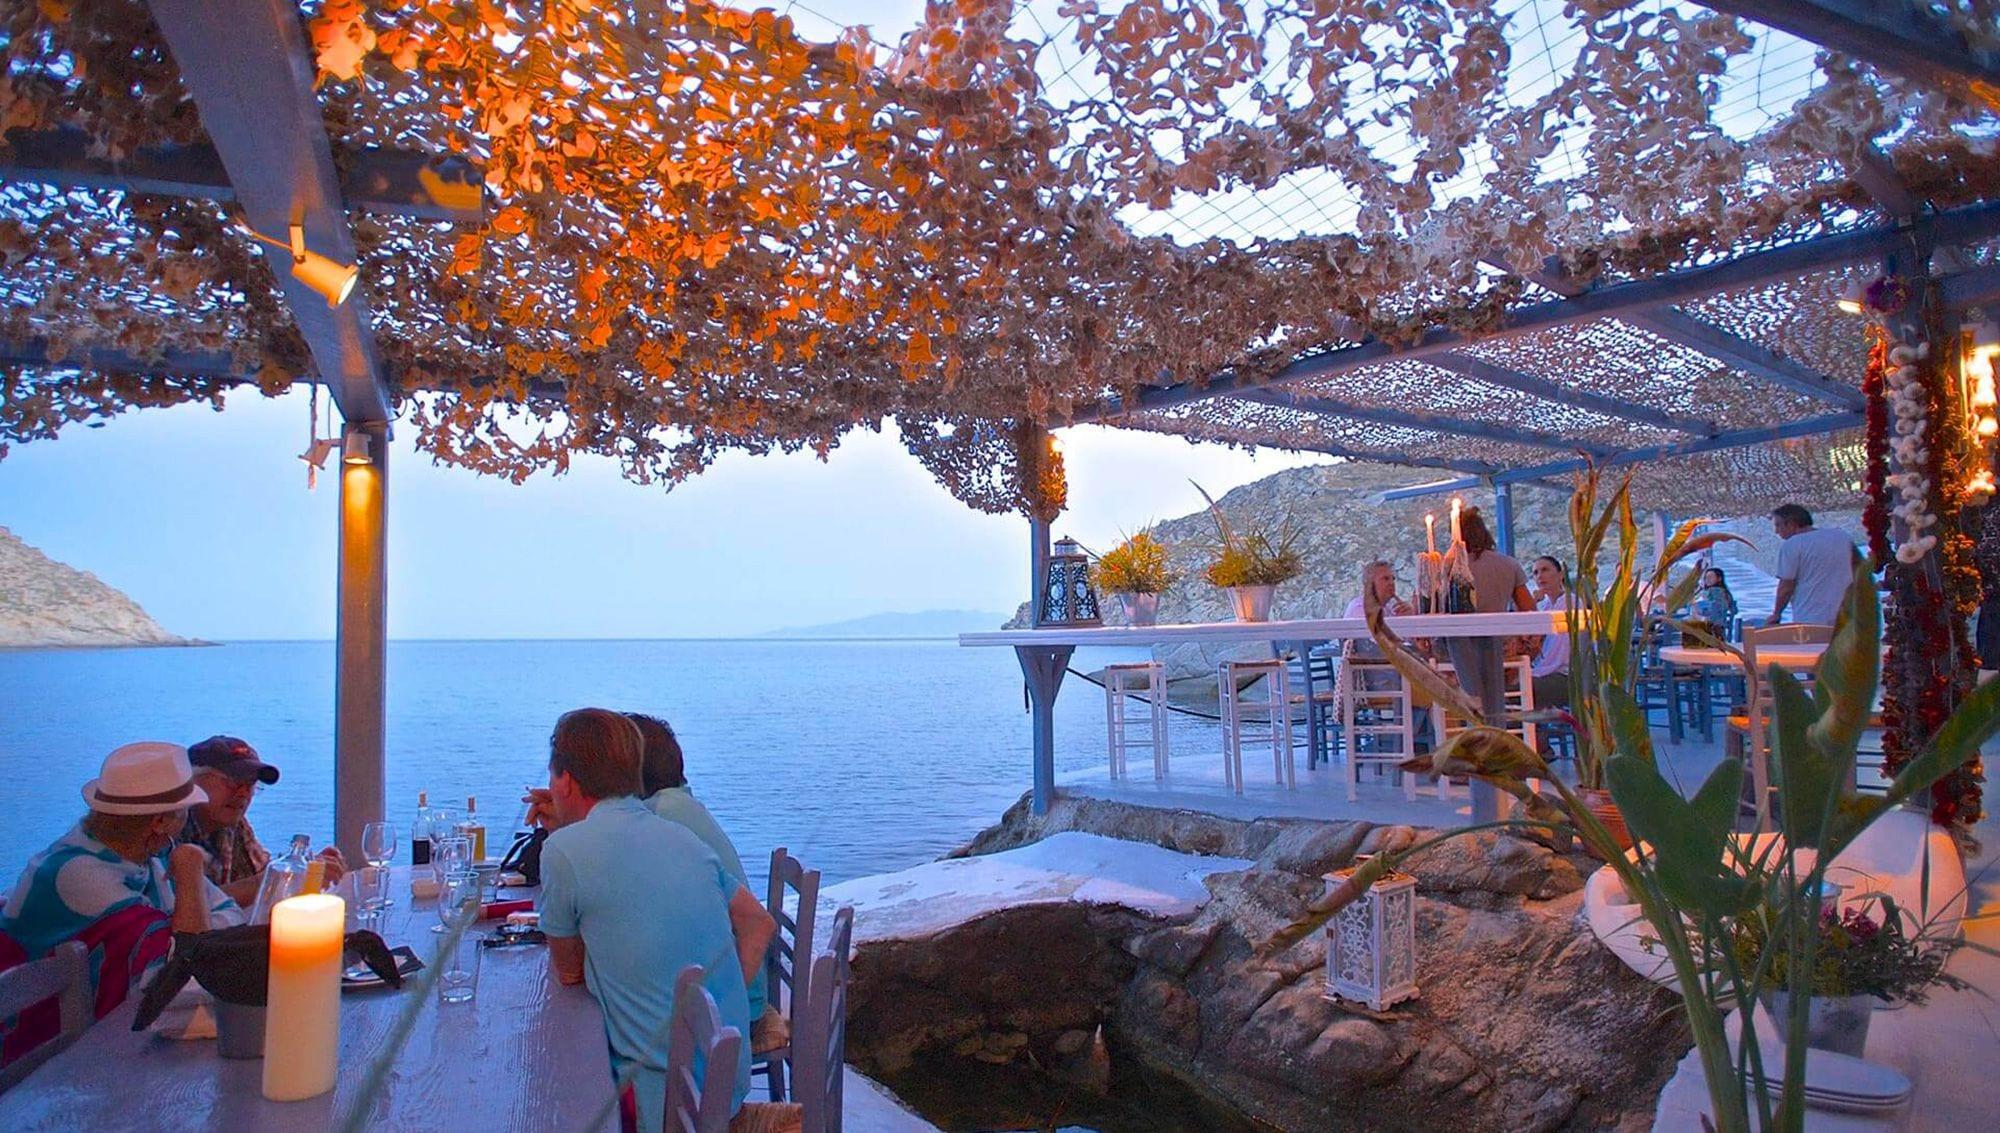 Mykonos: 5 of the best restaurants and beach bars on the Greek island